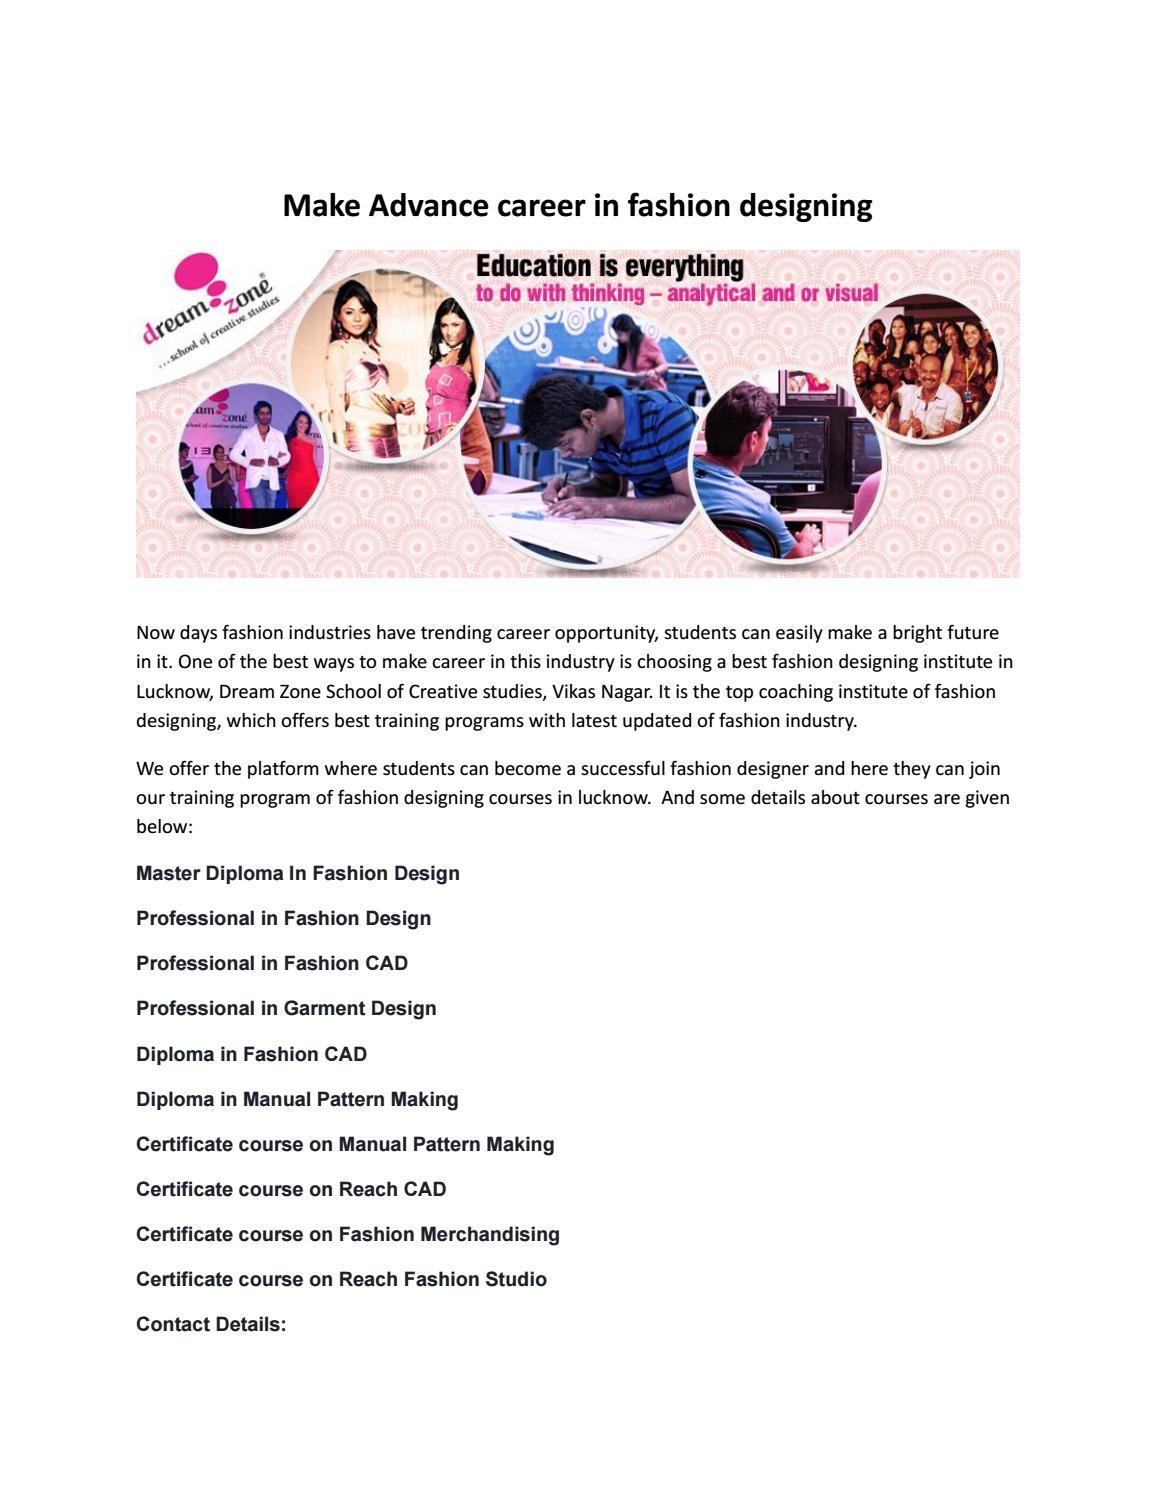 Dream Zone Vikas Nagar Lucknow Fashion Interior Graphics Designing Institute By Dreamzone Issuu